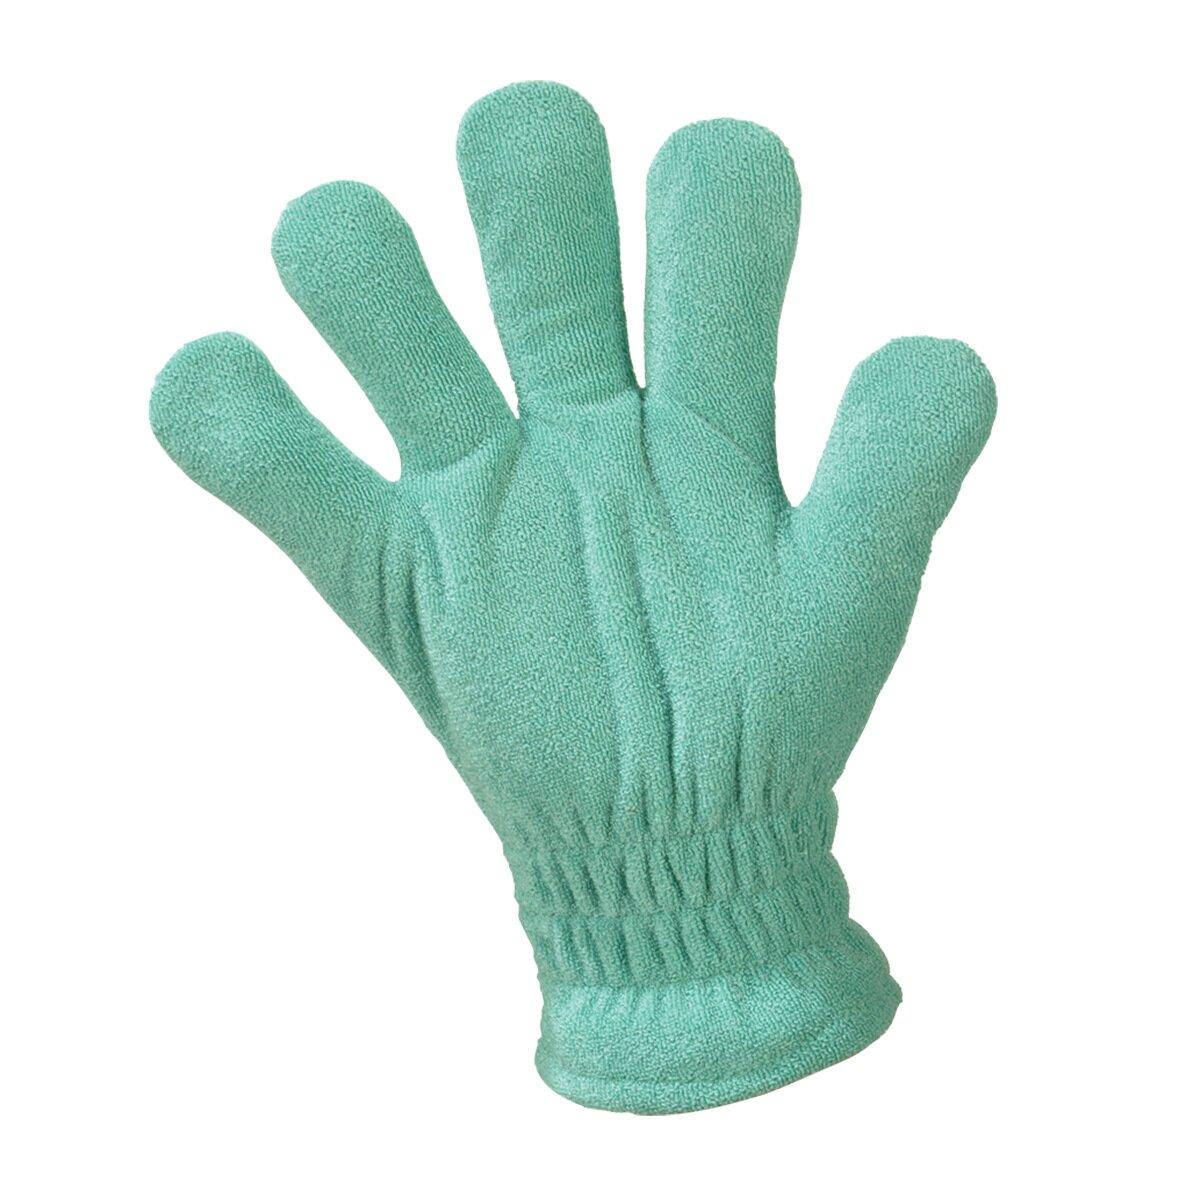 Microfiber Cloth Bundle: Microfiber Cleaning Bundle